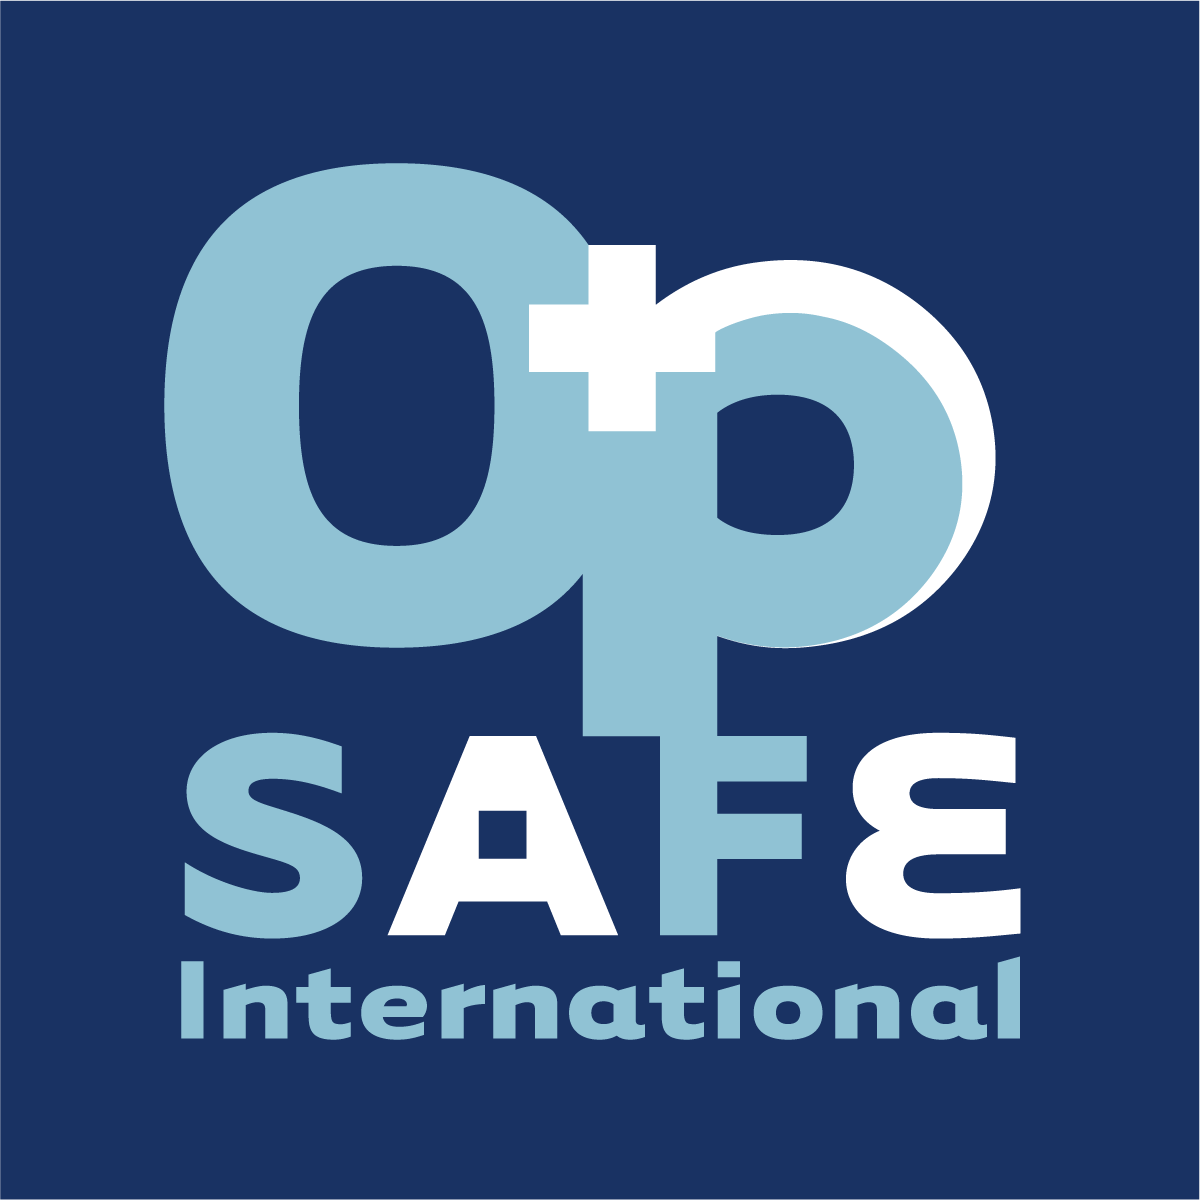 Operation Safe